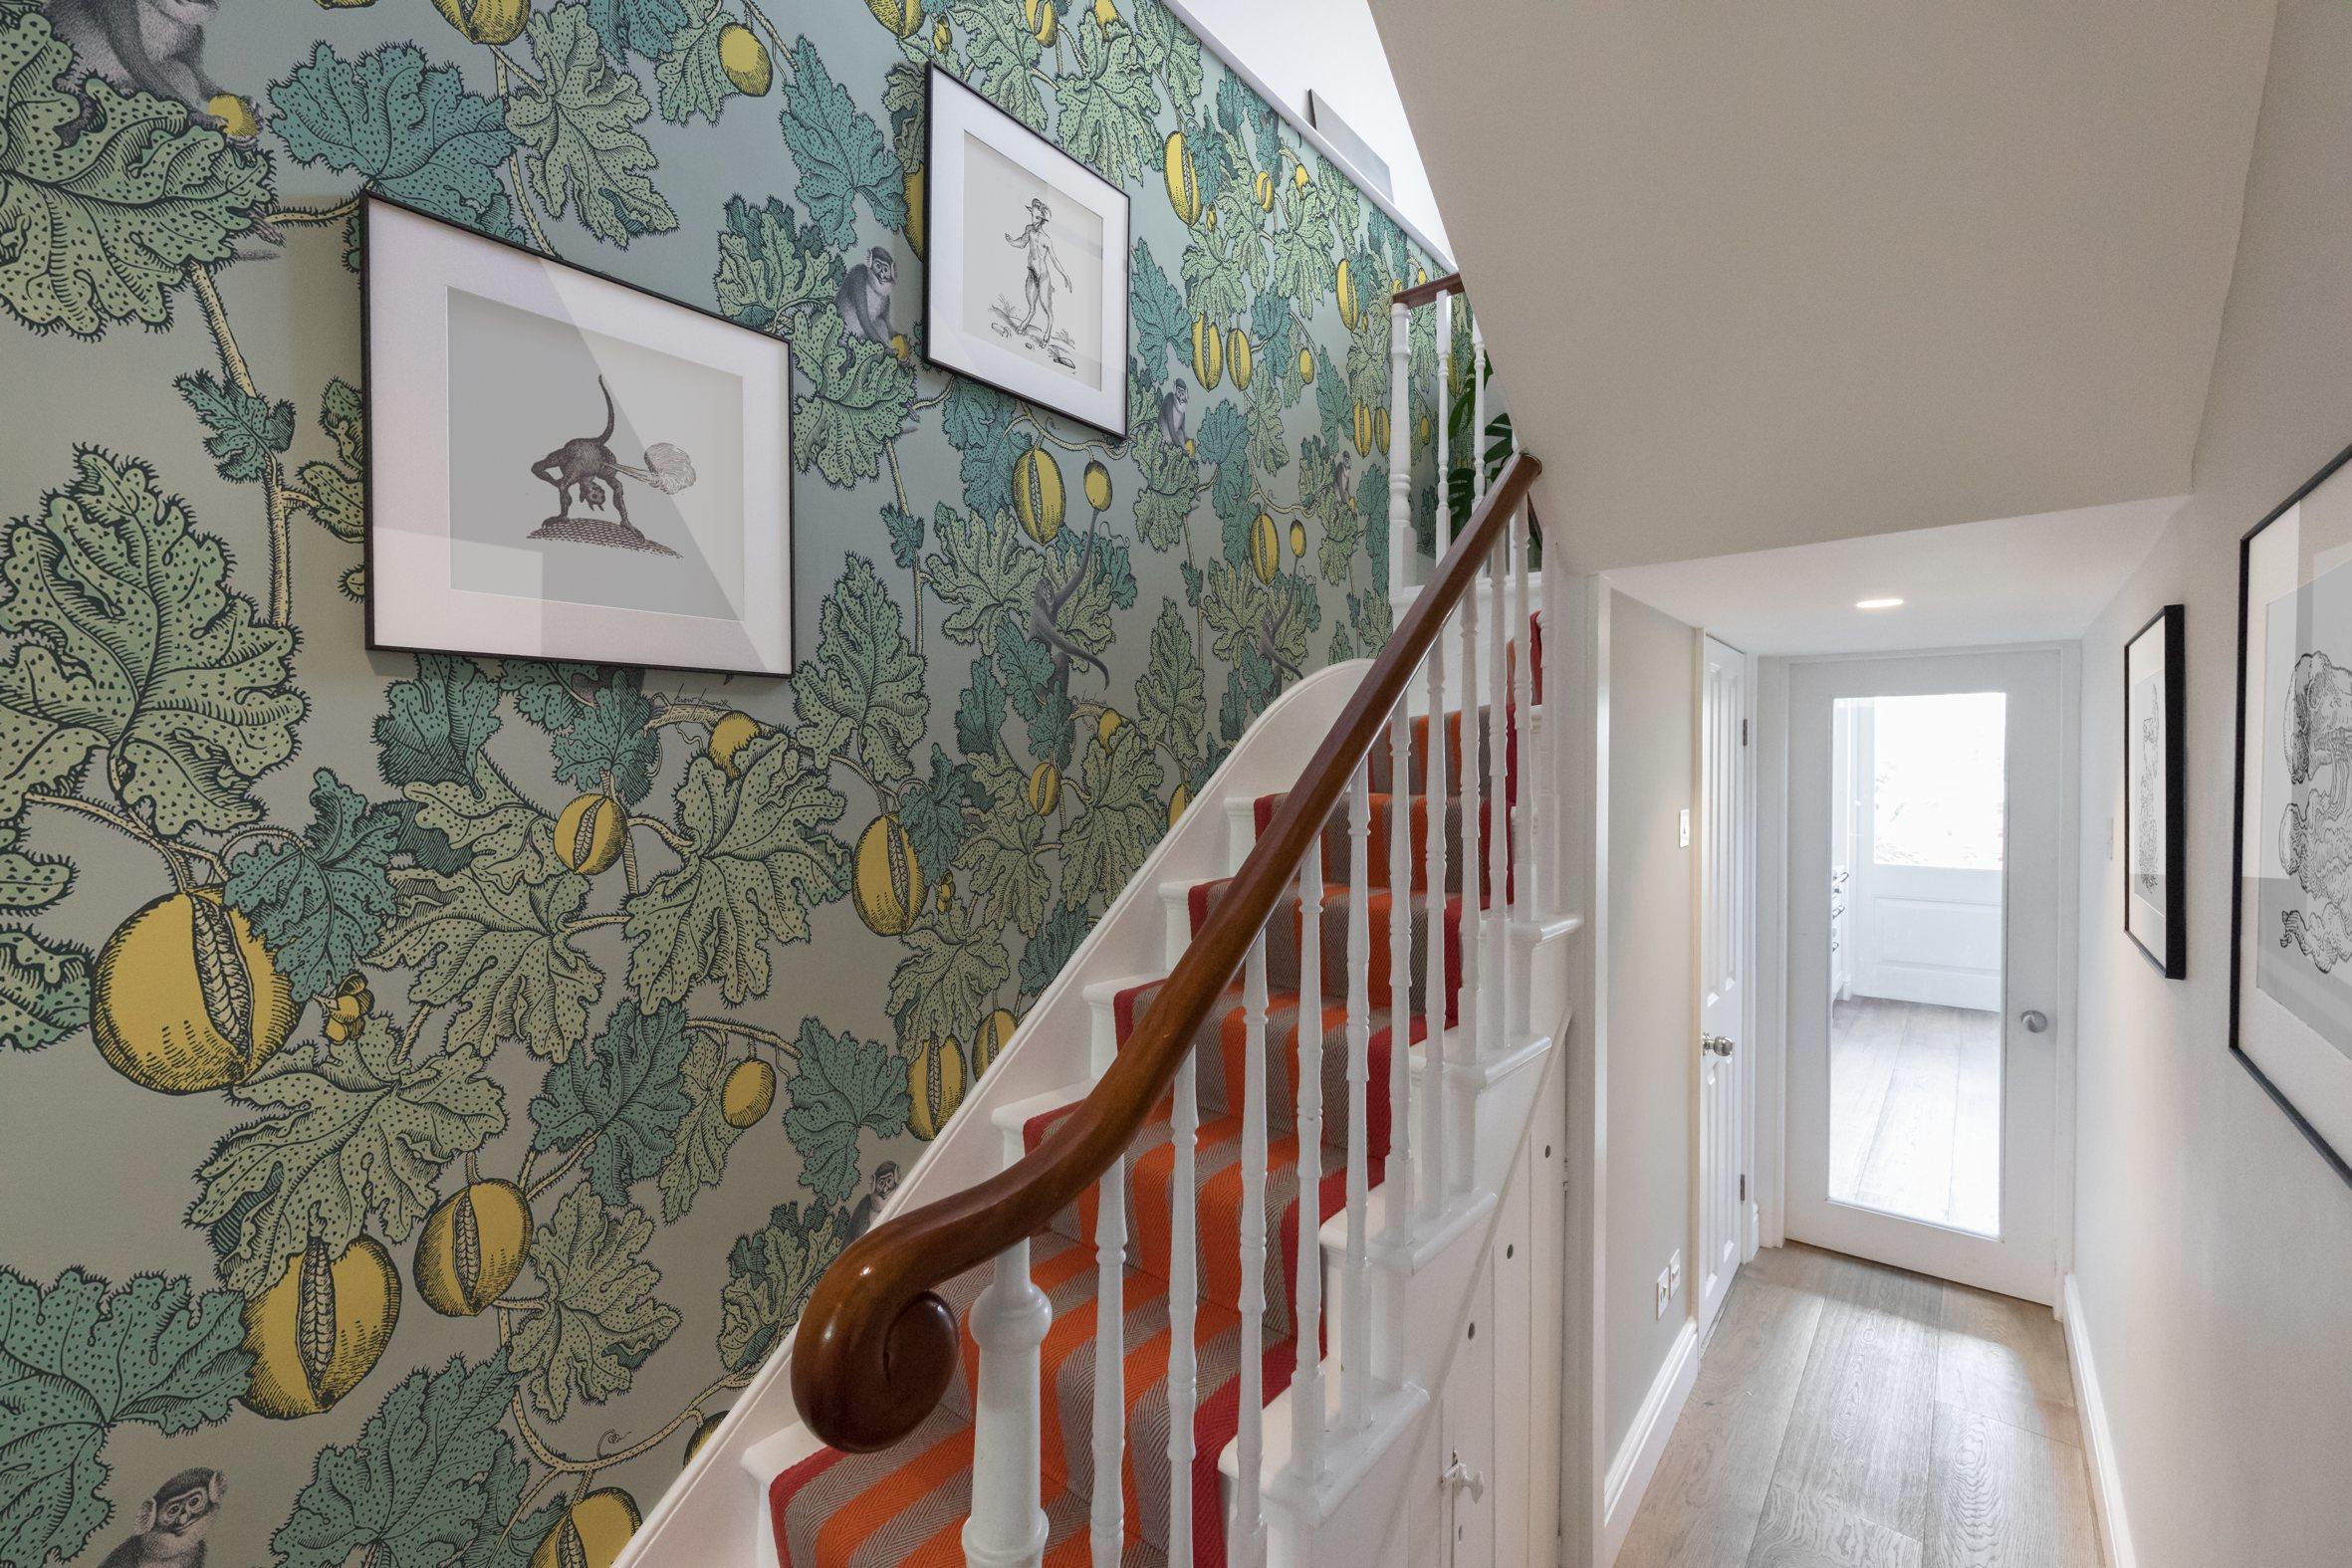 Richmond staircase interior design